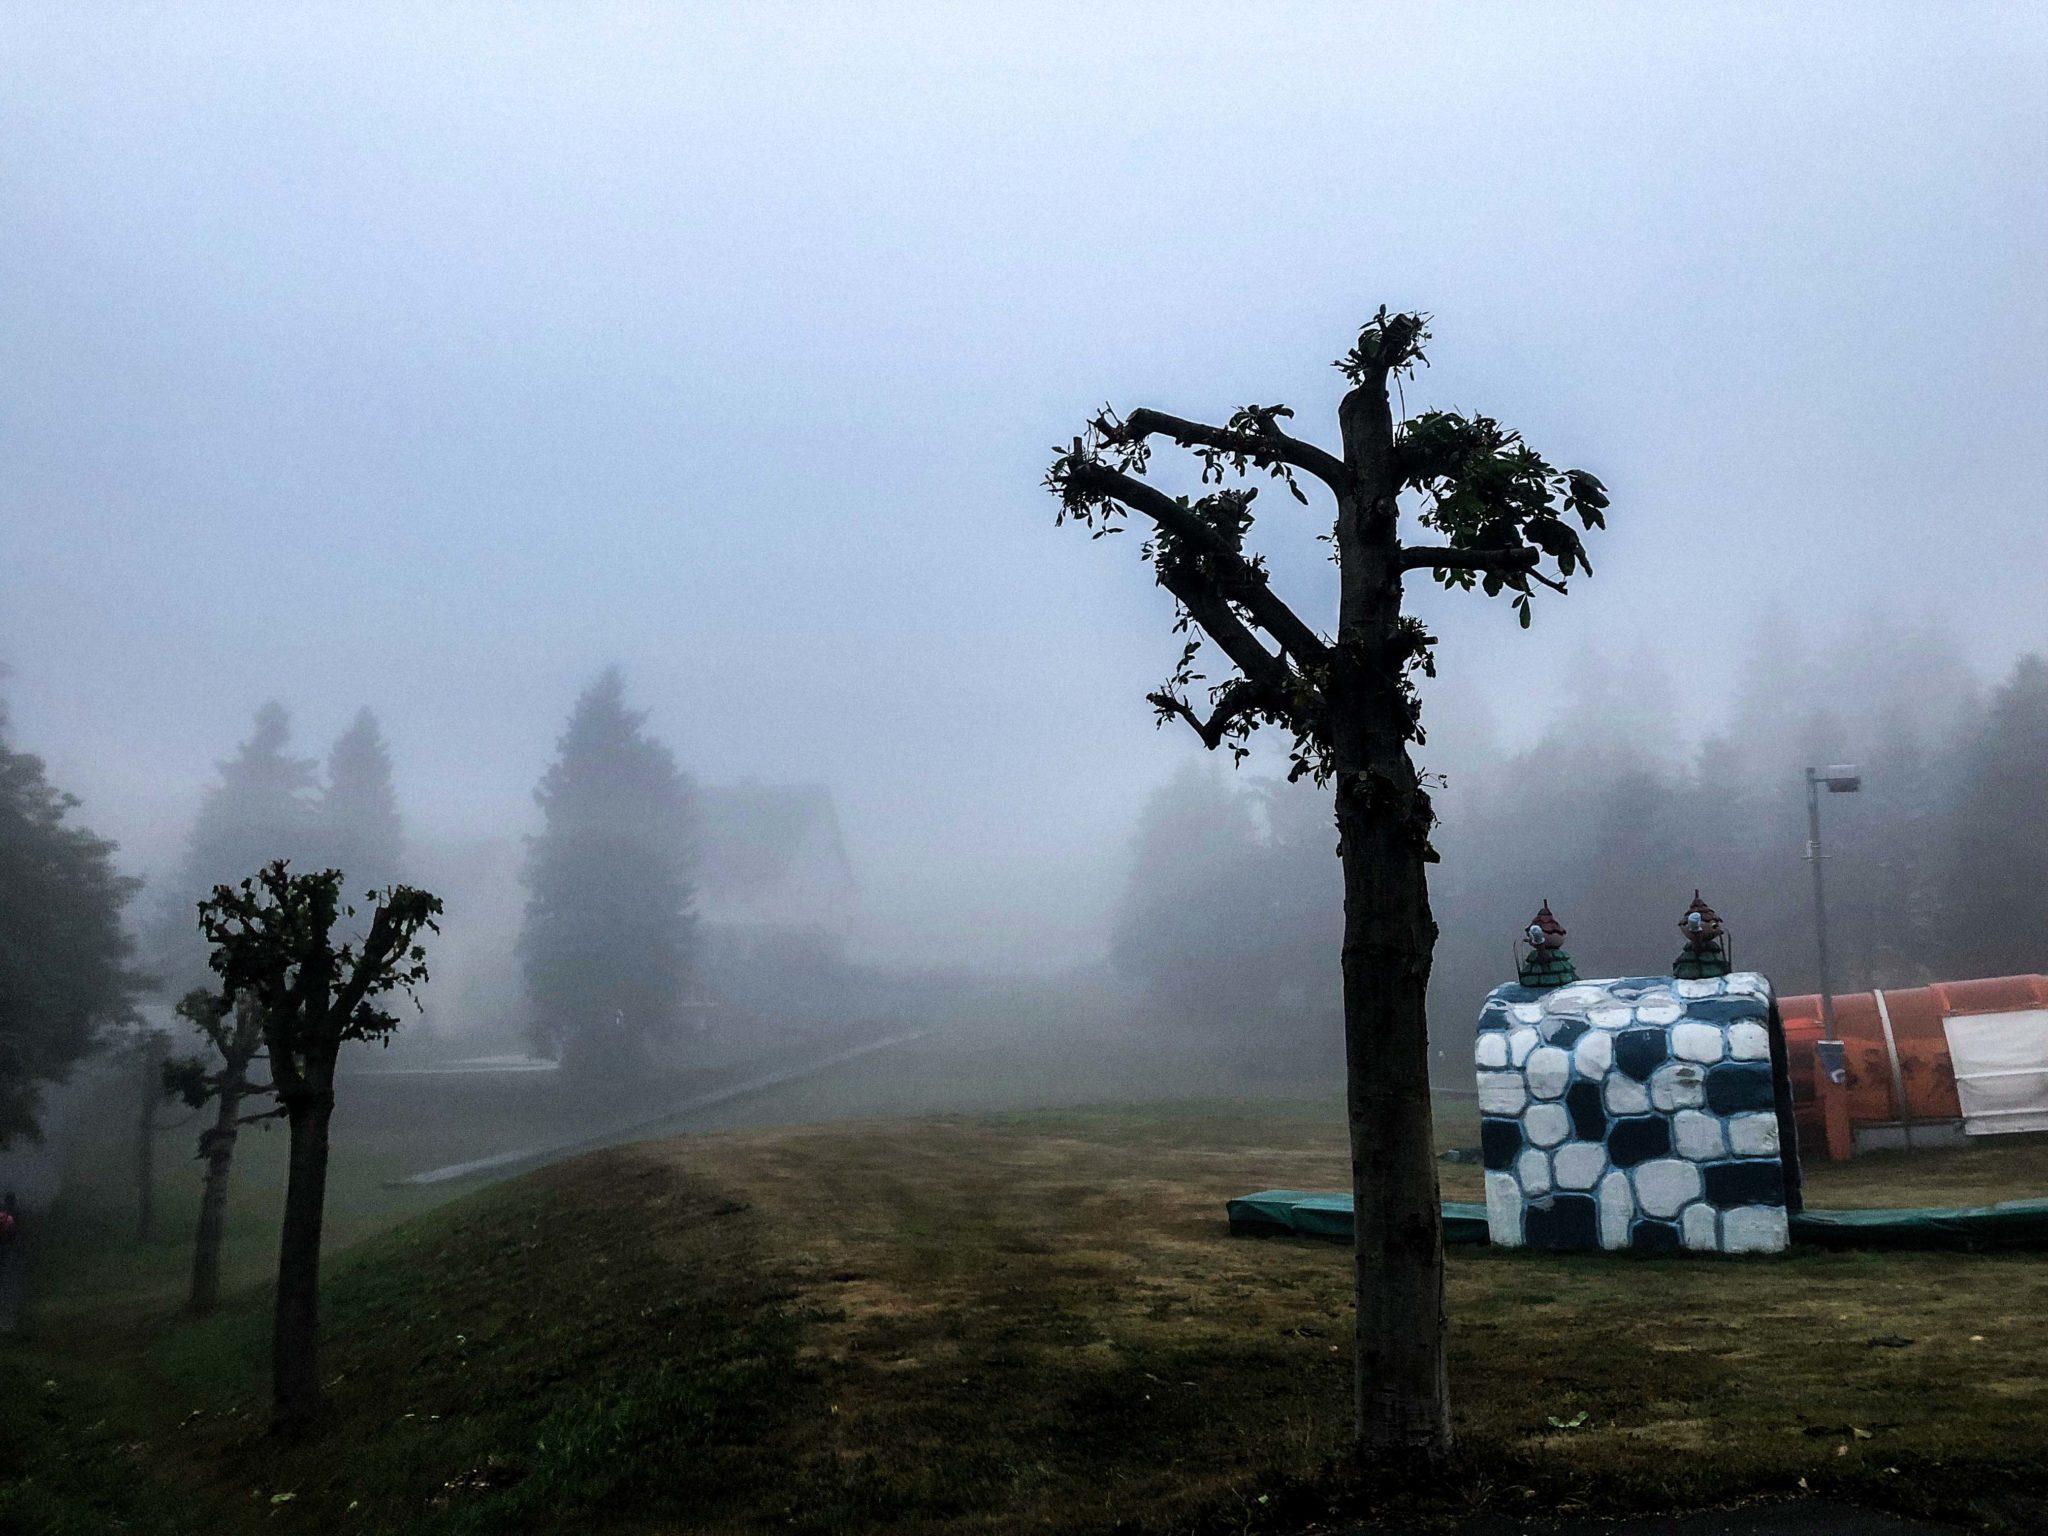 Oberwiesenthal Nebel Erzgebirge